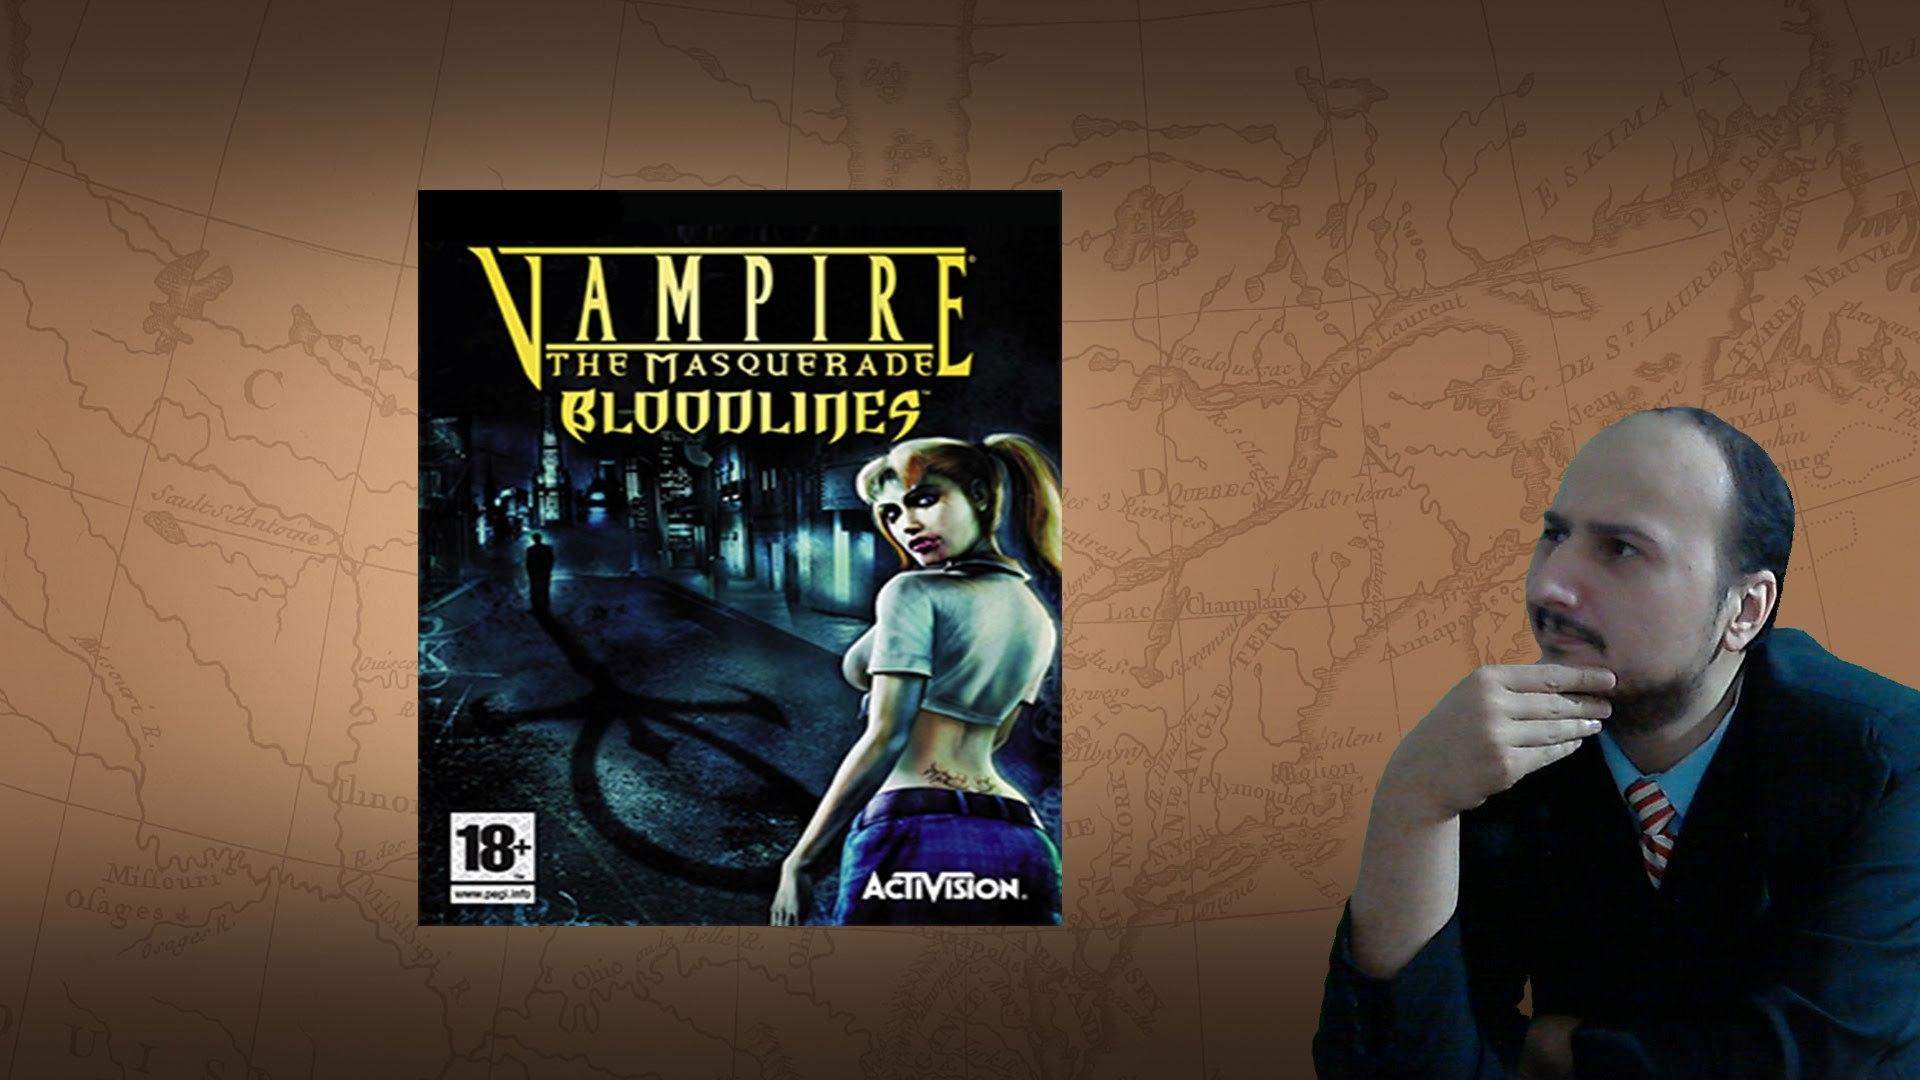 Gaming History: Vampire The Masquerade Bloodlines